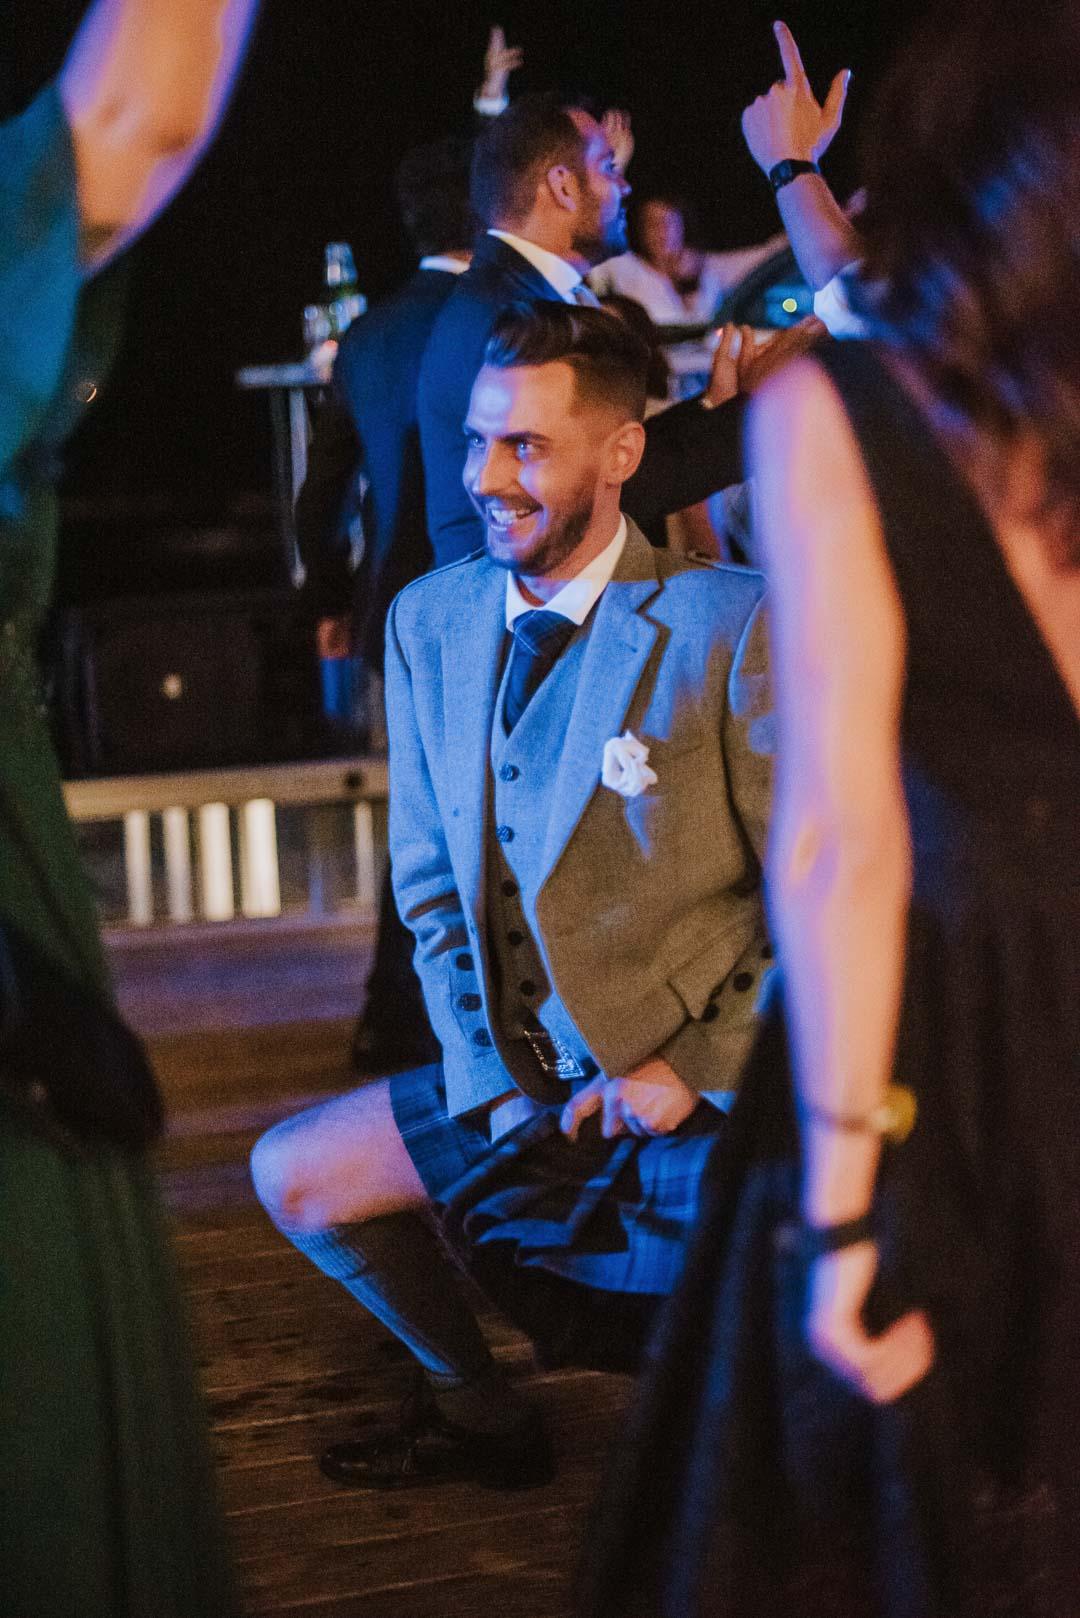 wedding-photographer-destination-fineart-bespoke-reportage-napoli-nabilah-vivianeizzo-spazio46-207